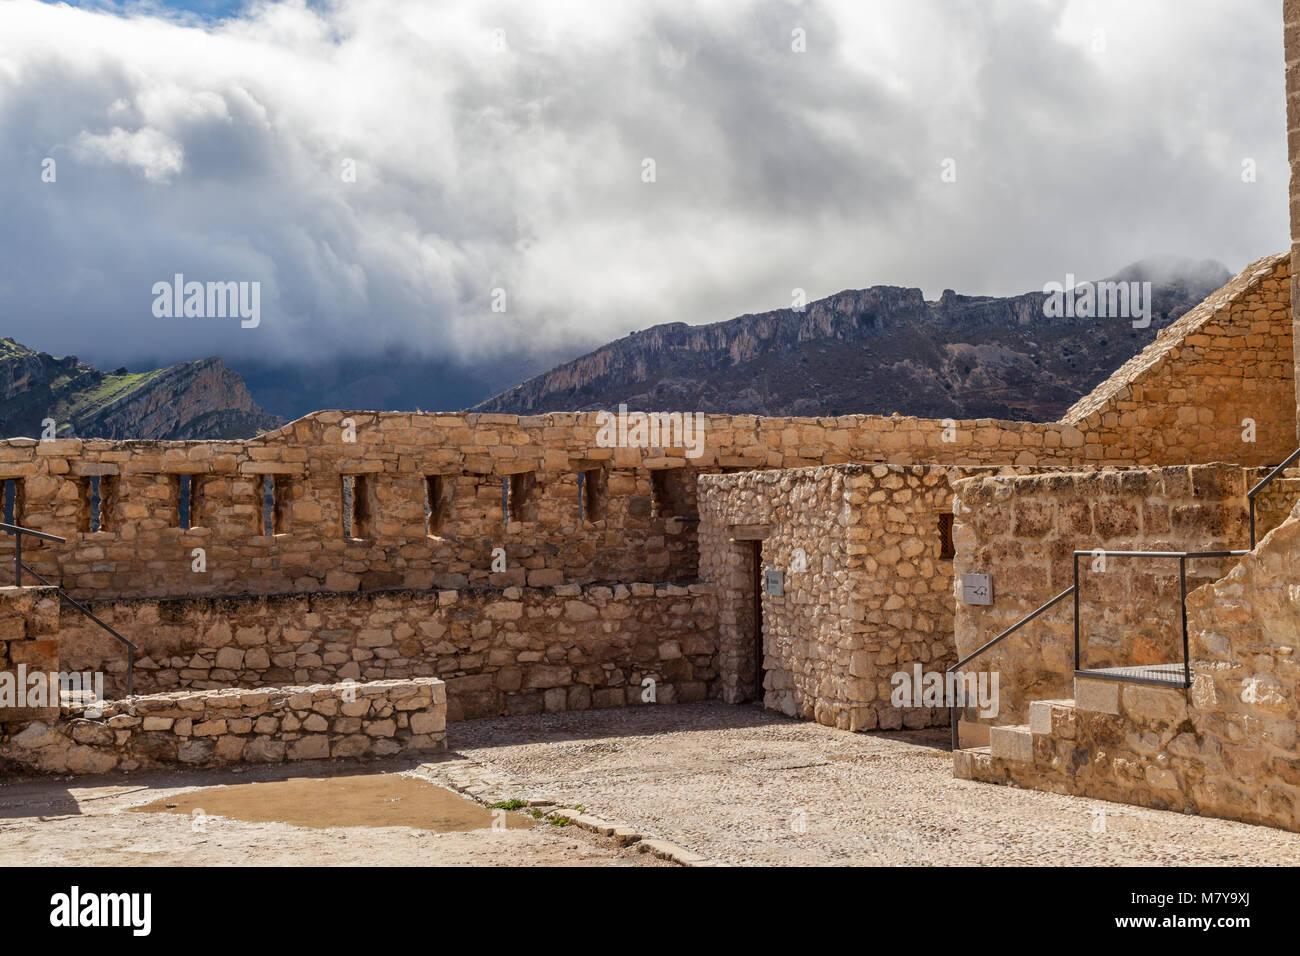 castillo de santa catalina castle in jaen spain - Stock Image